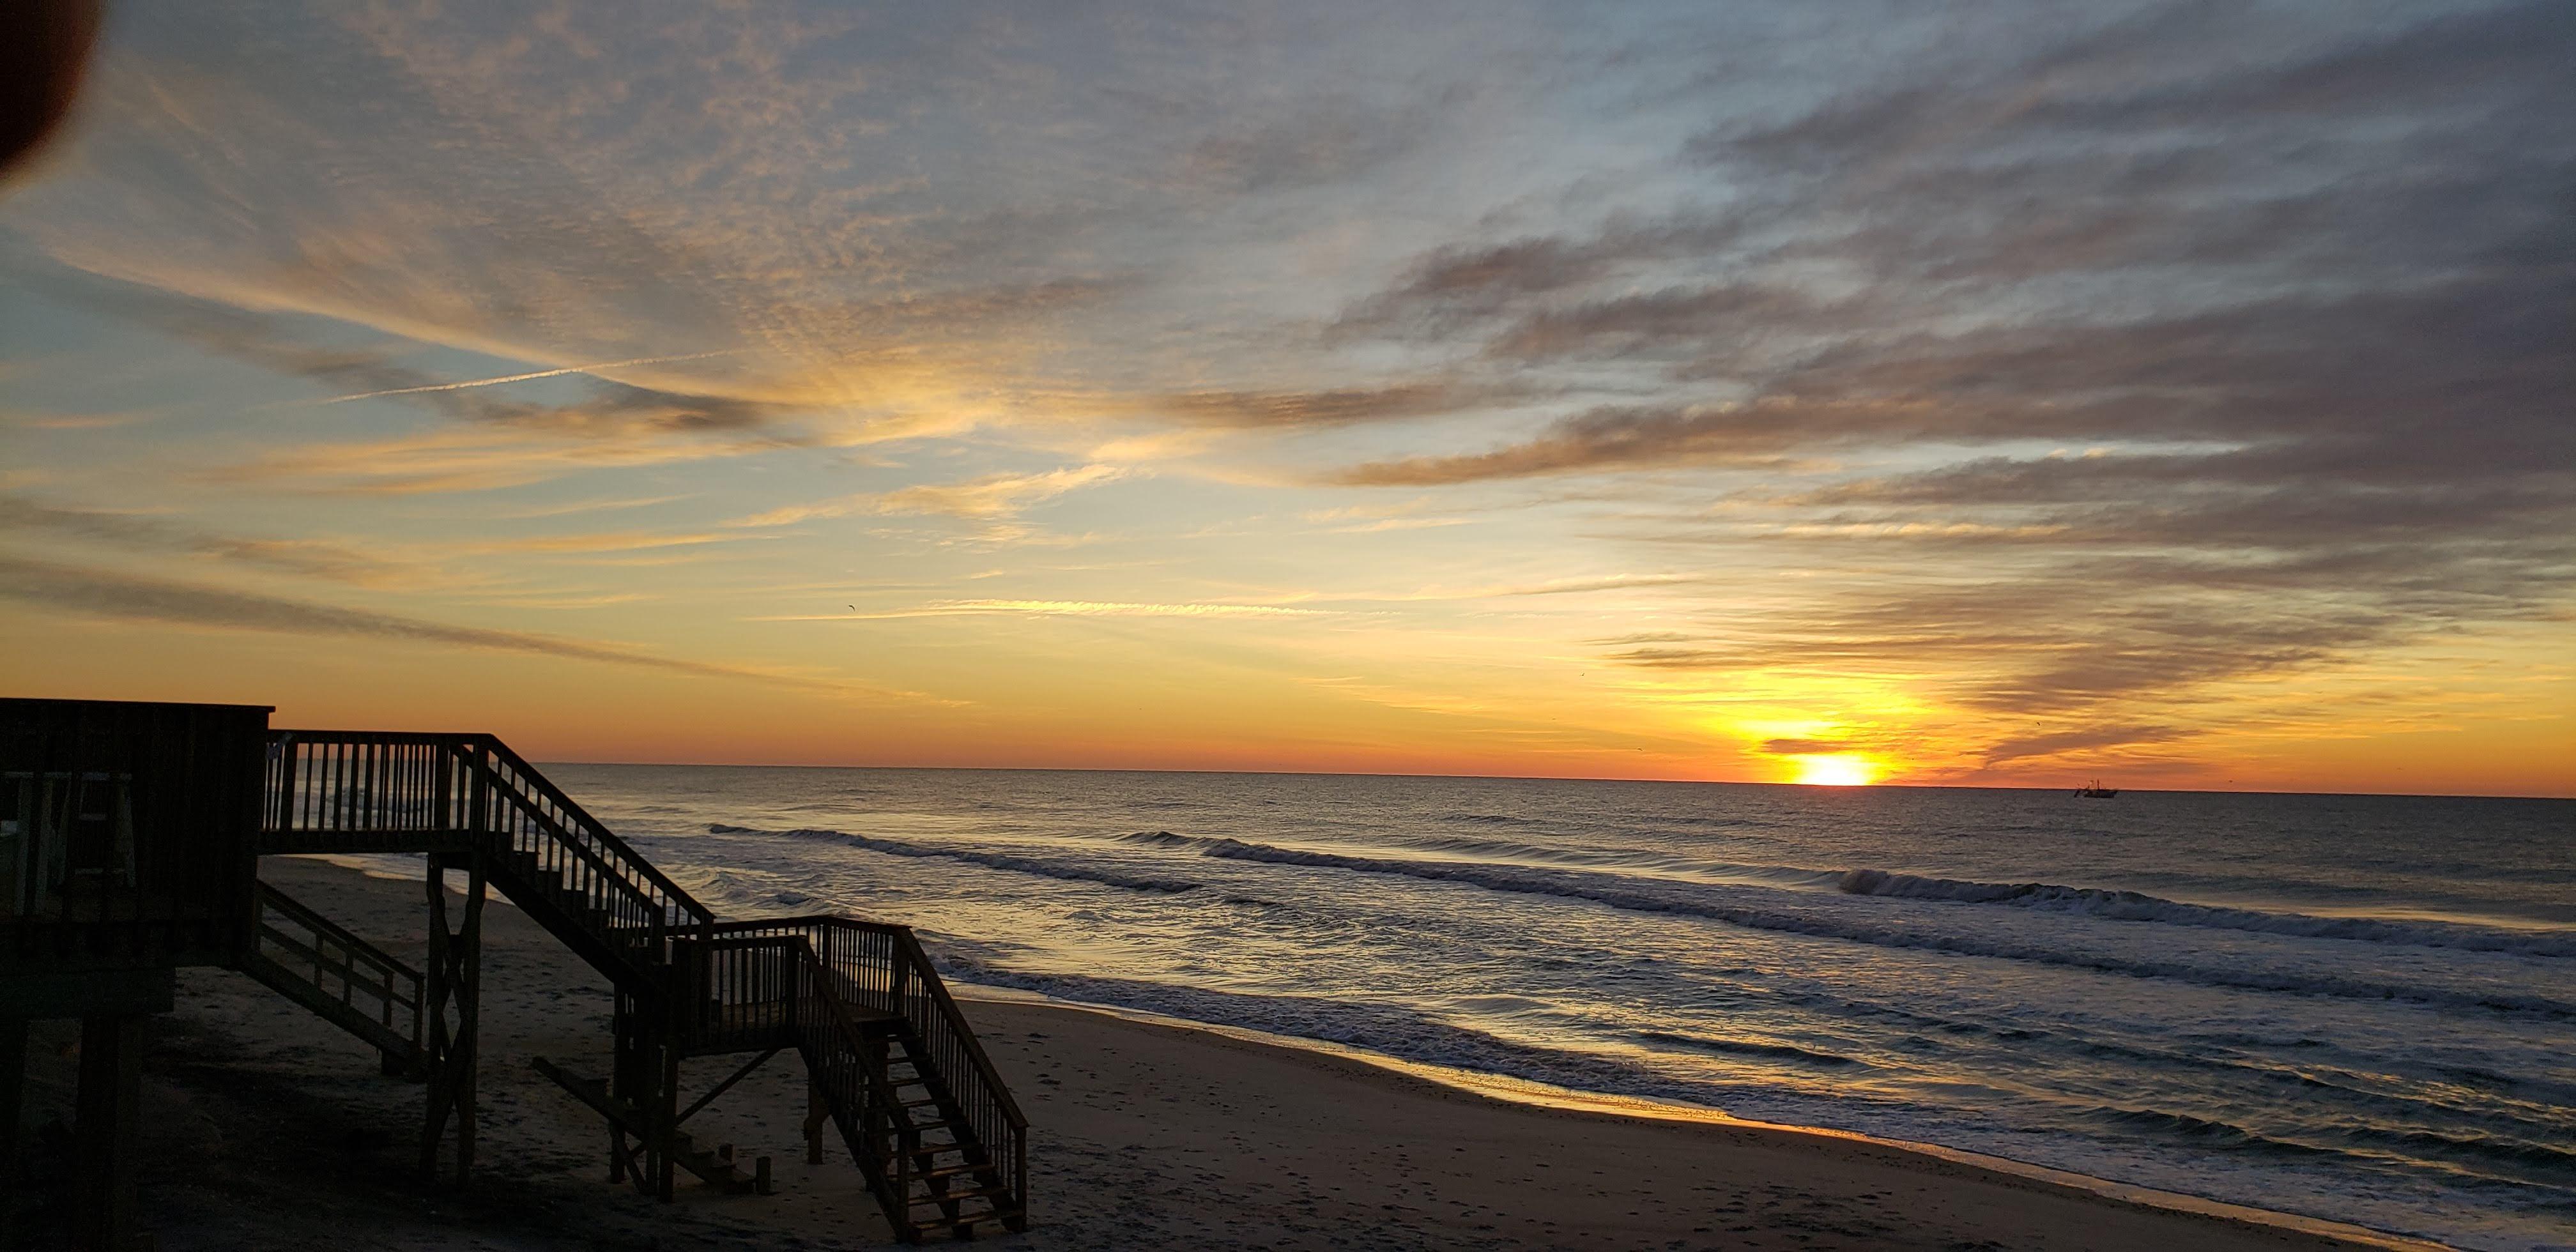 Sunset on Topsail Island, NC